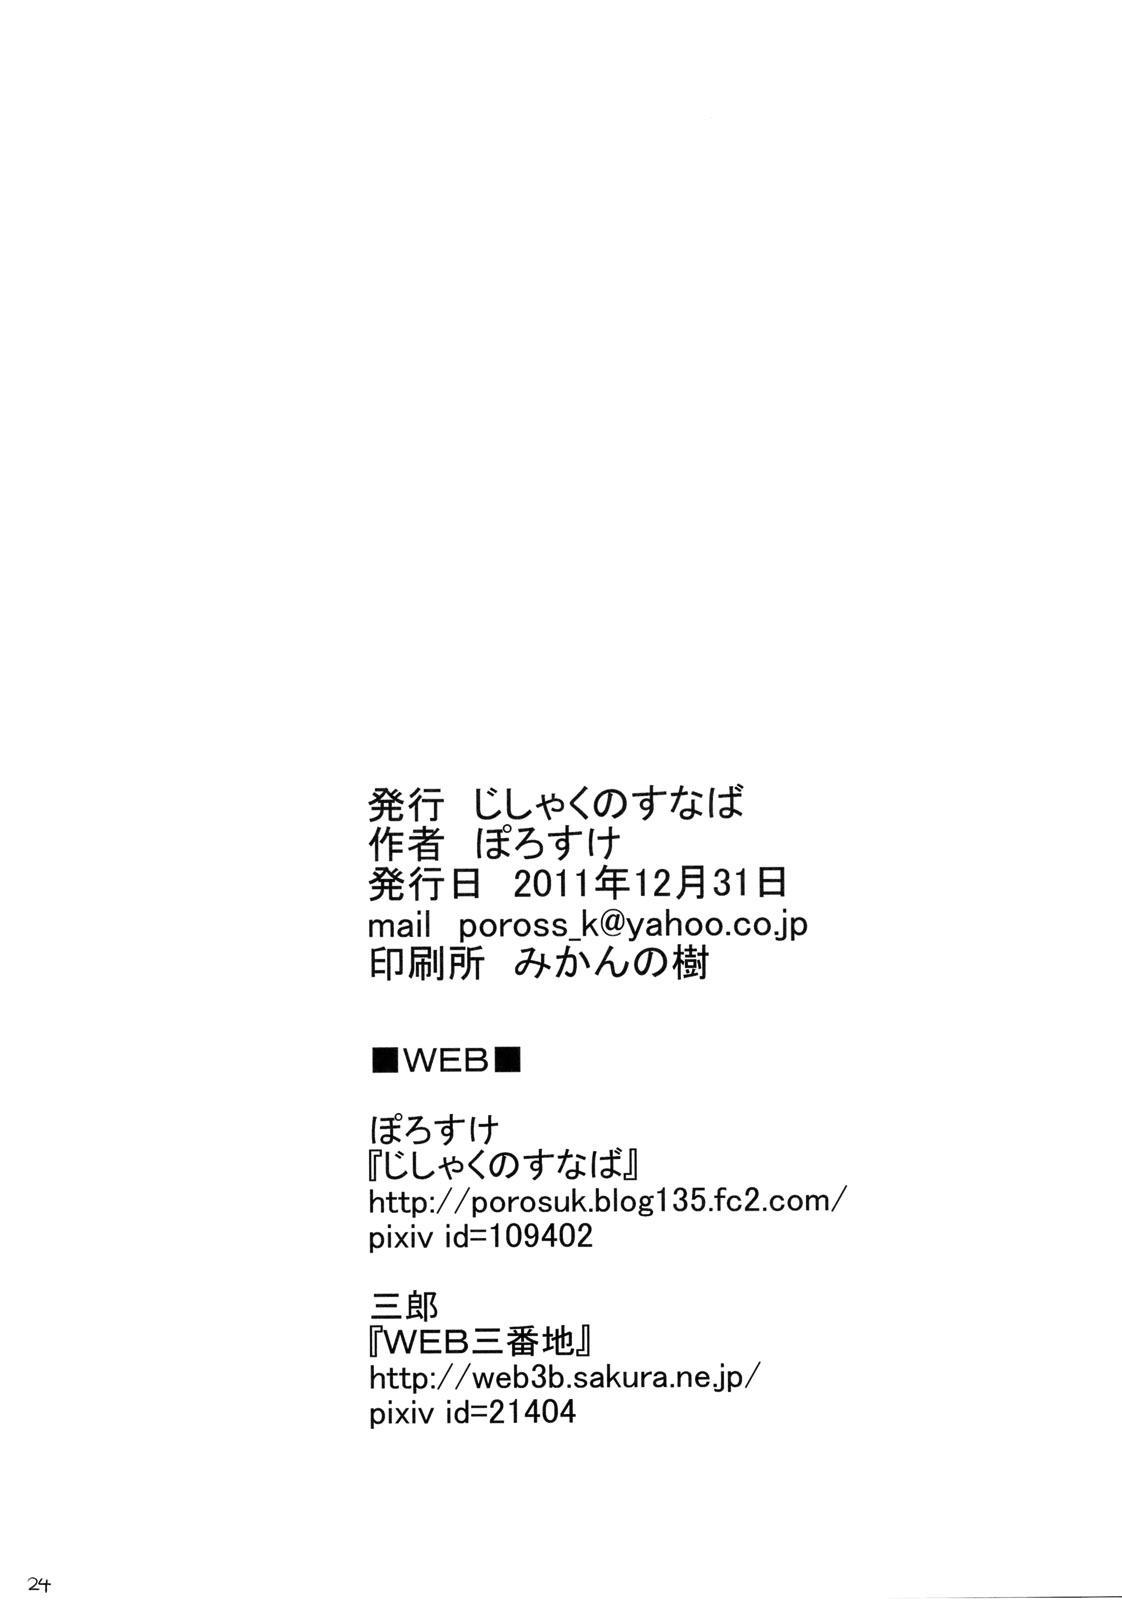 Yui Azu Tinpo Mugi Anal + Omakebon 24